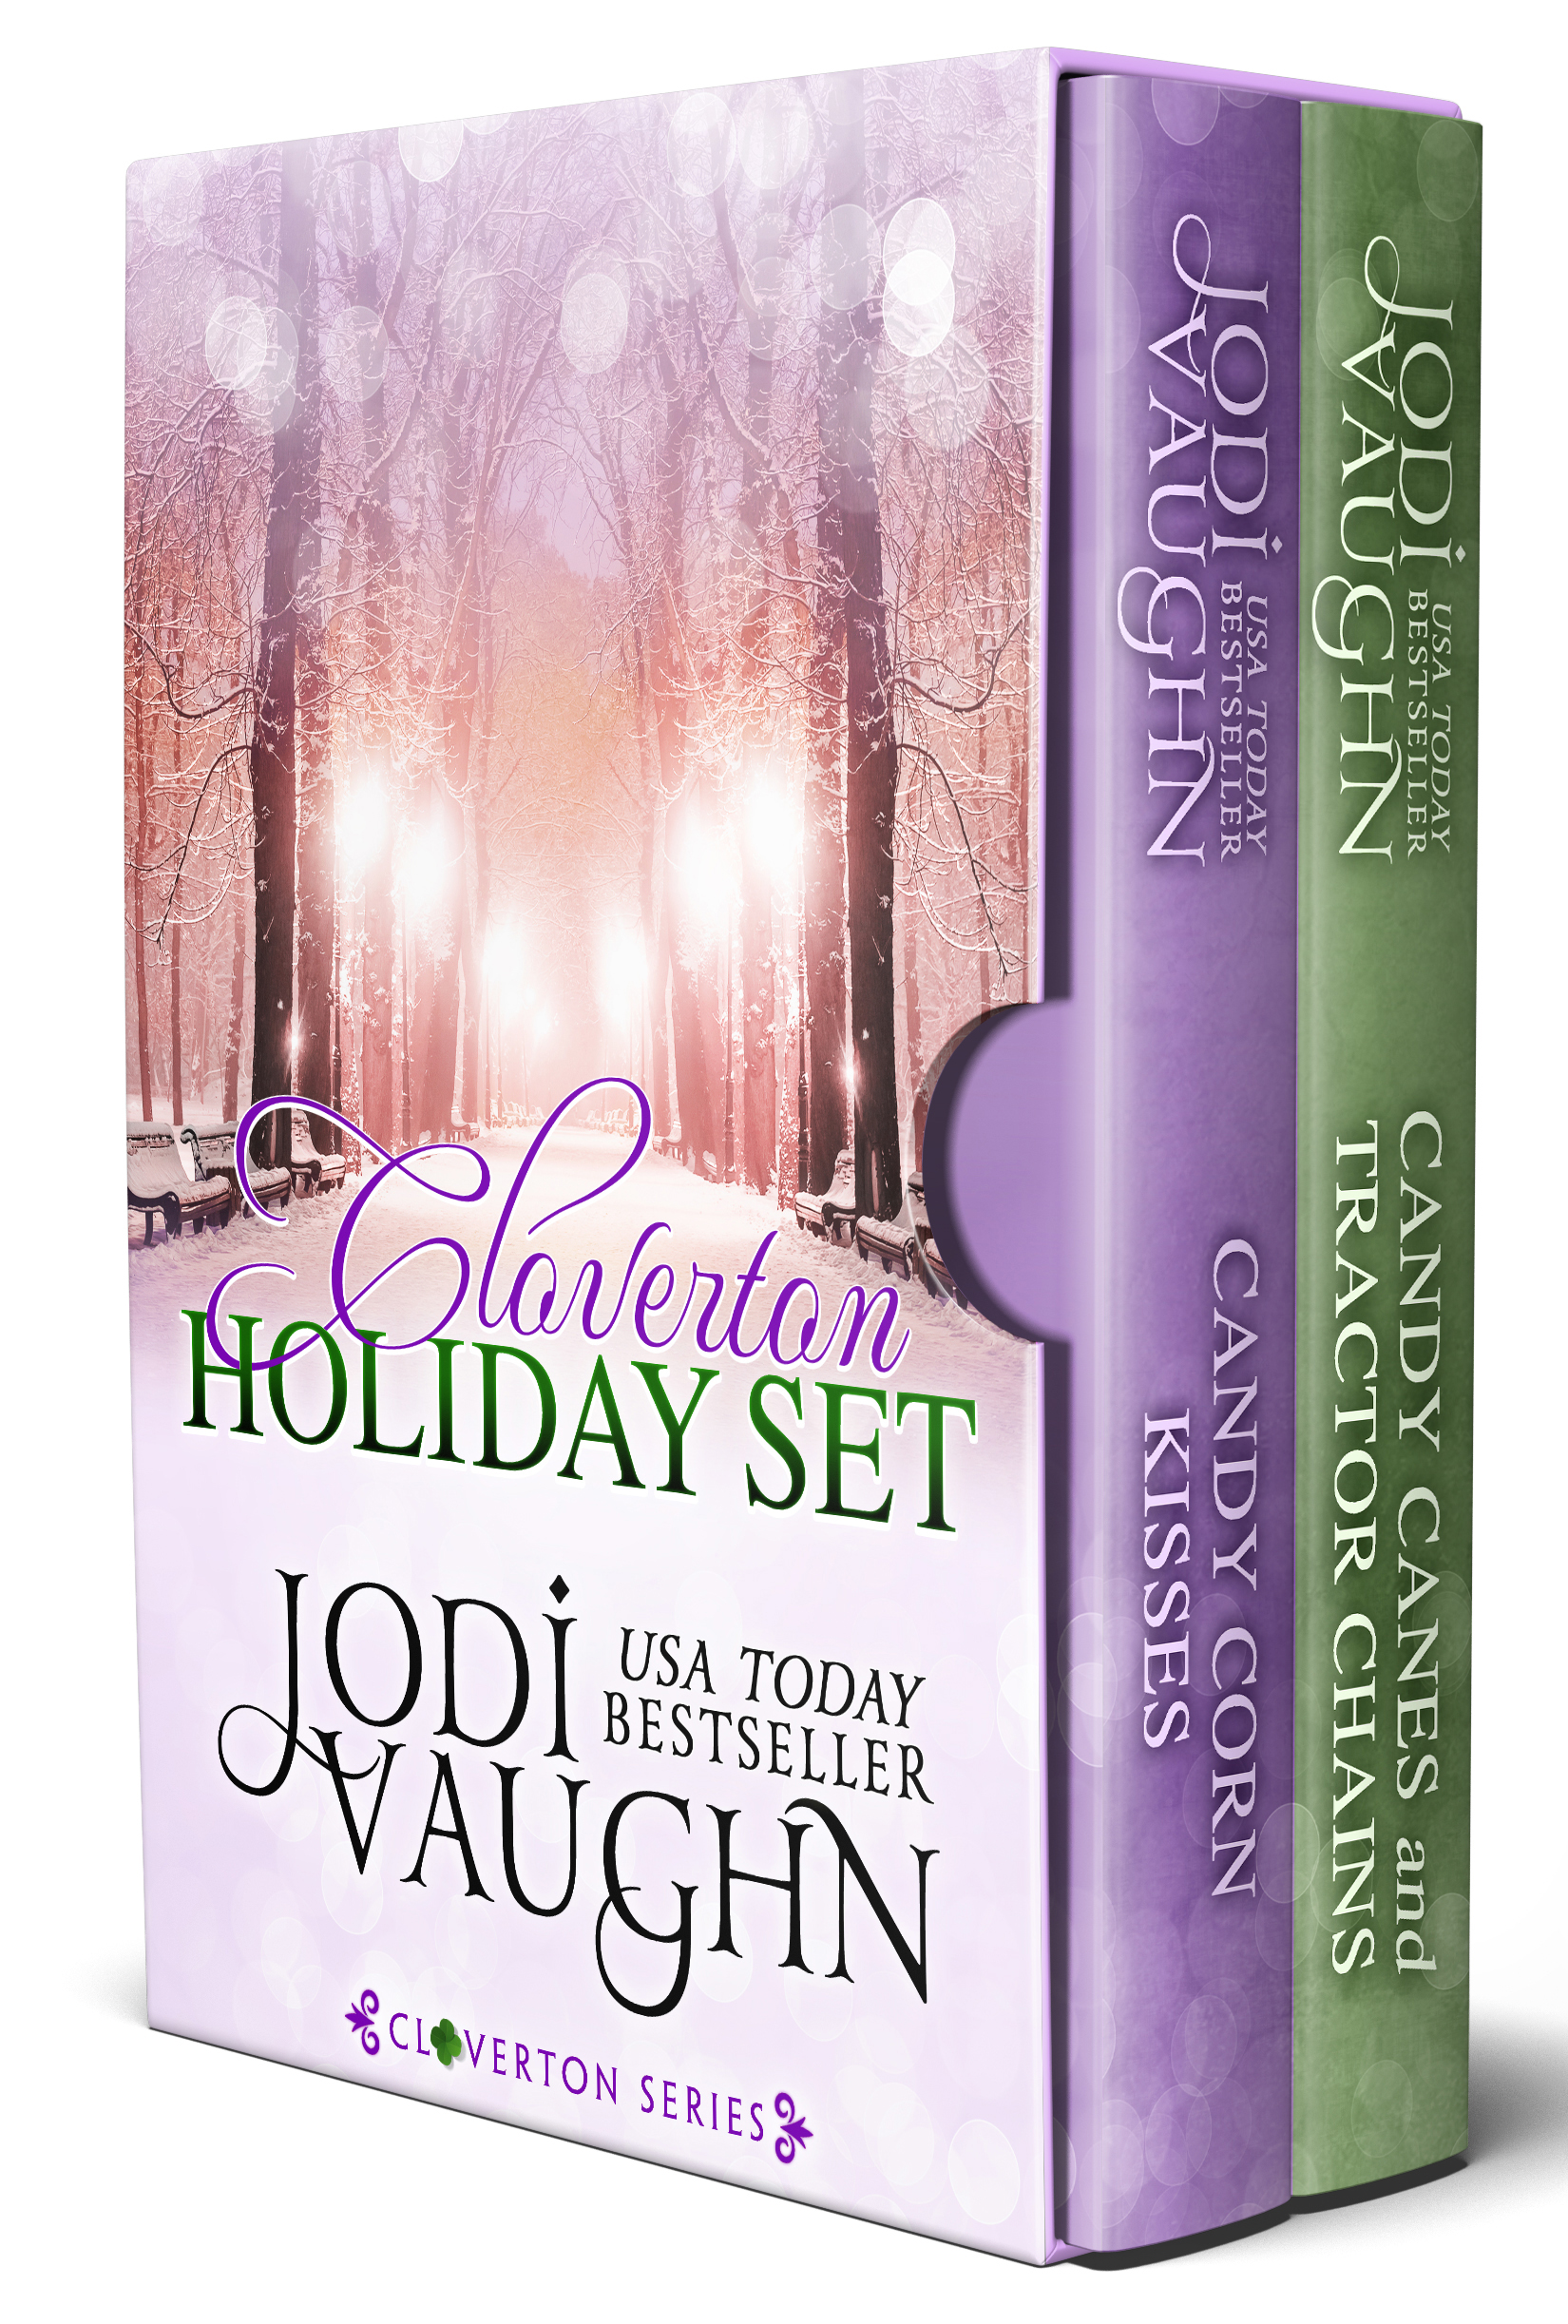 Cloverton Holiday Set